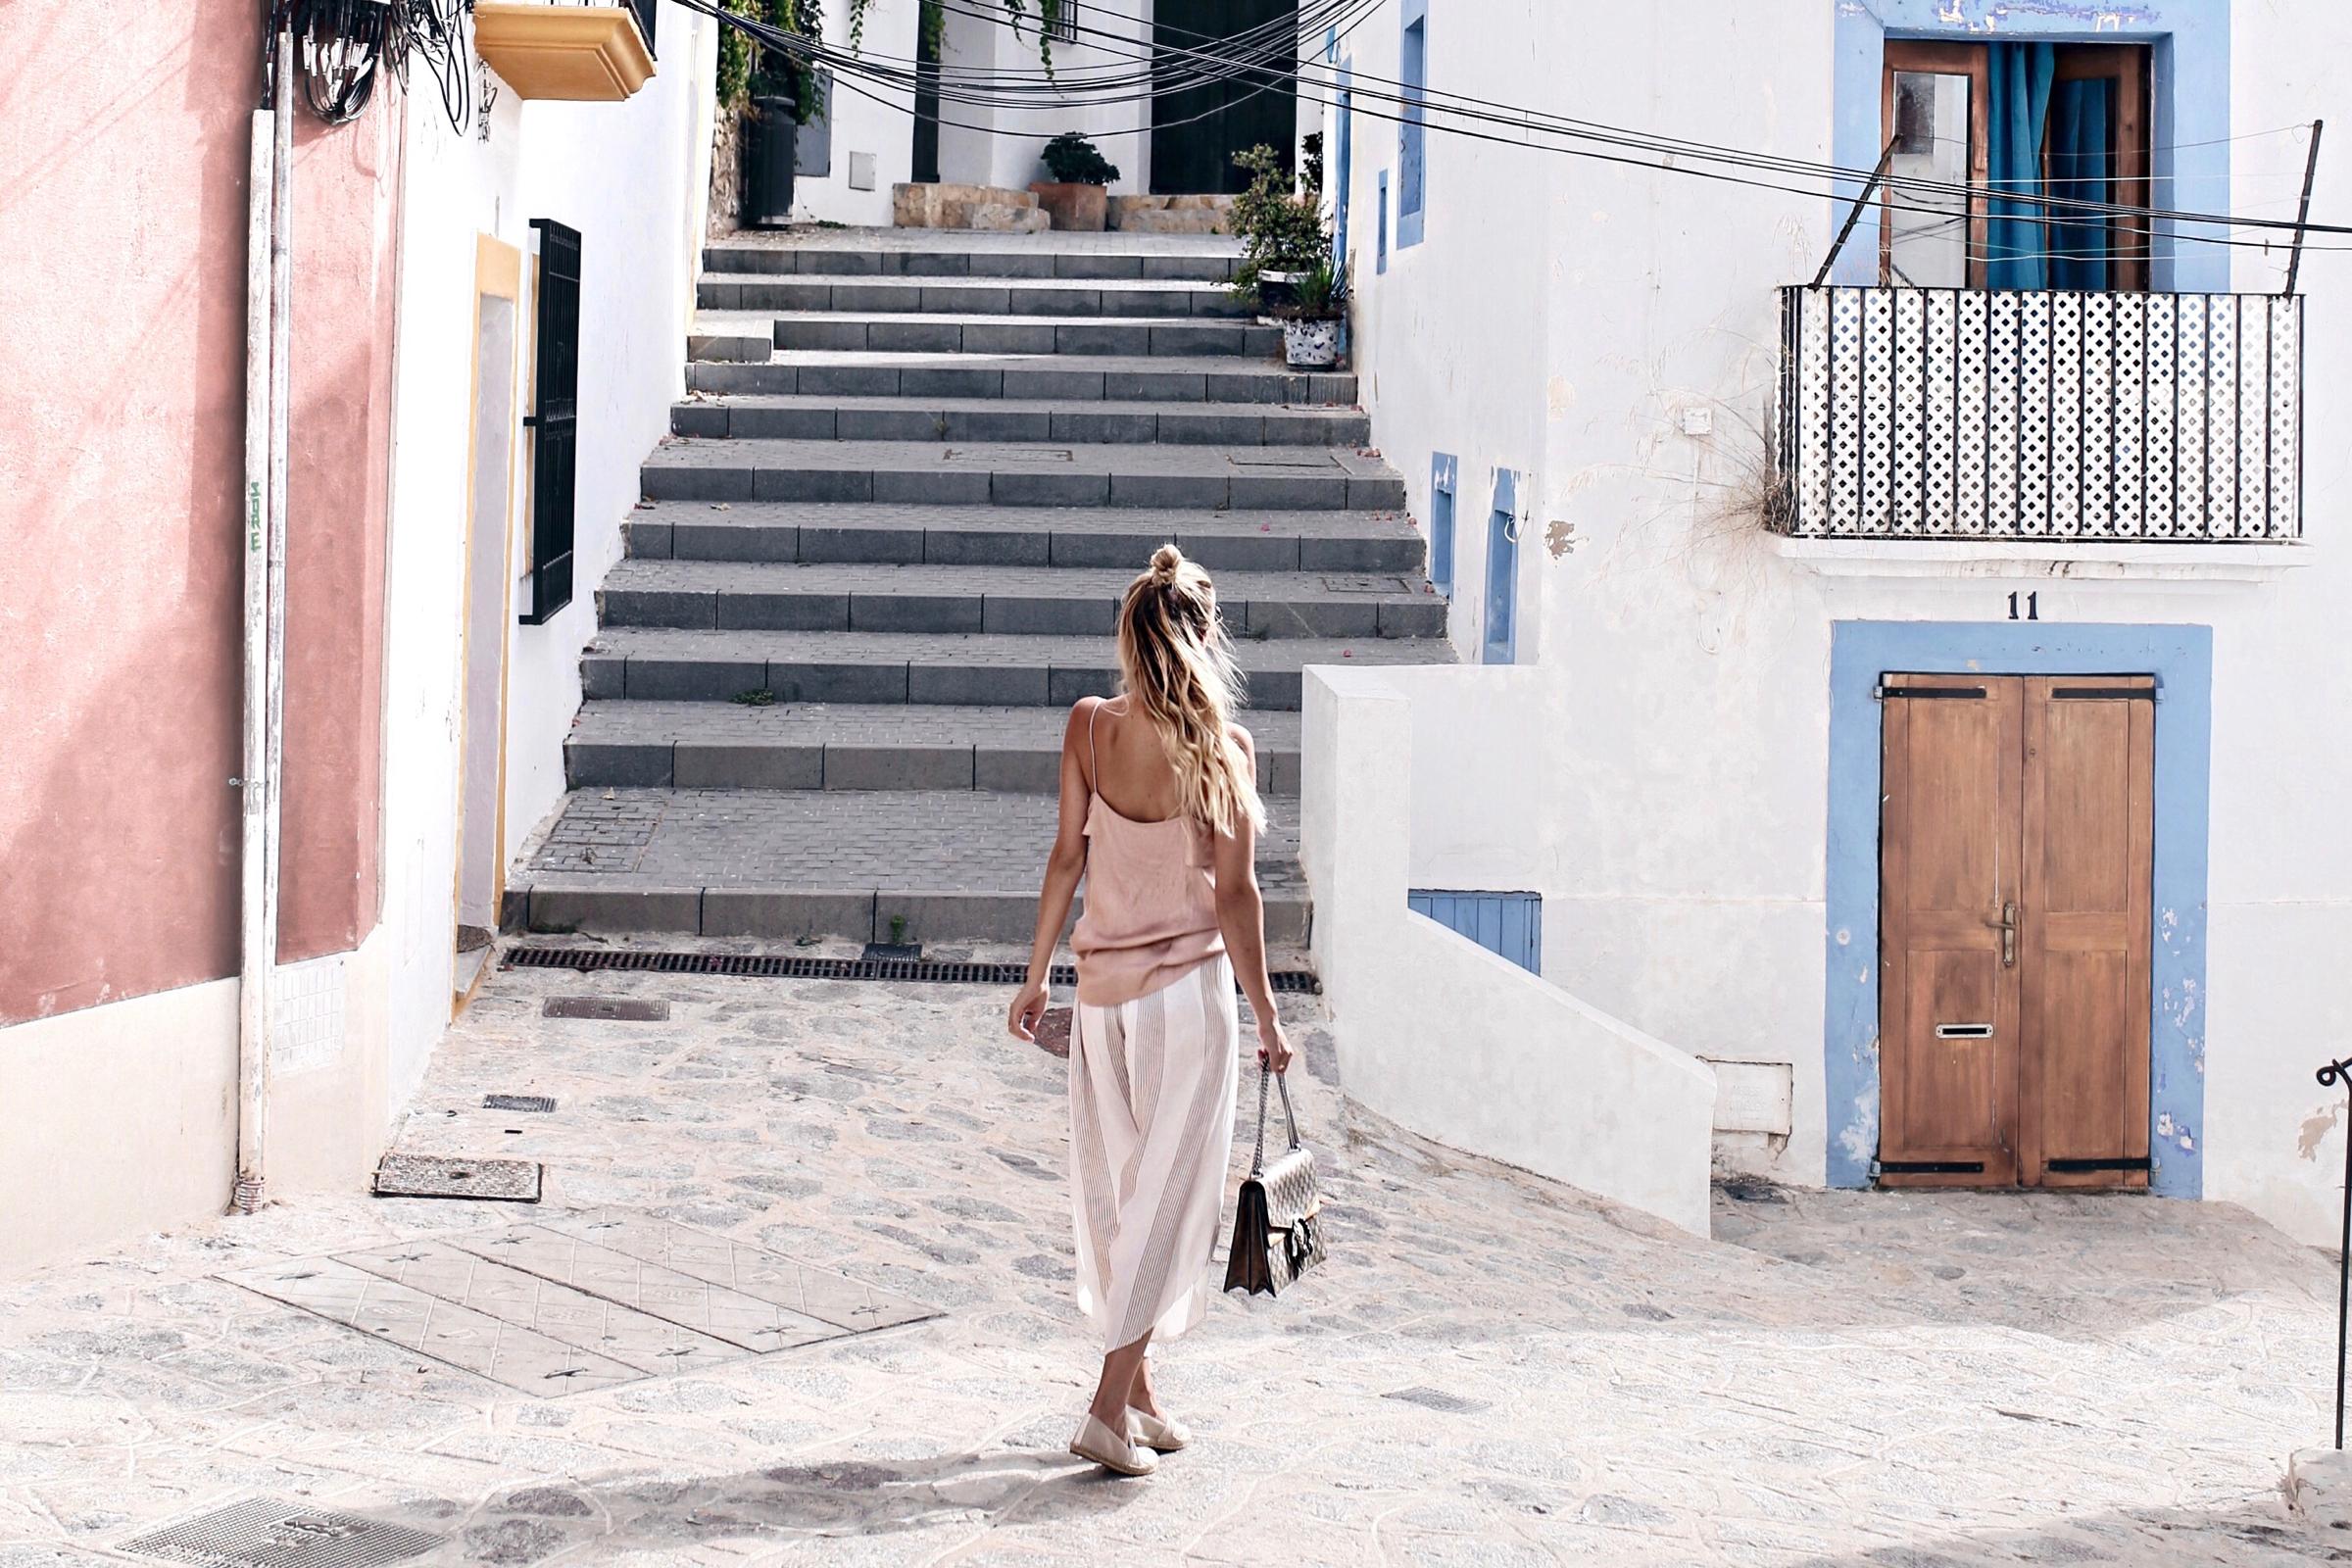 Tory Burch Espadrilles & Neutrals | Ibiza